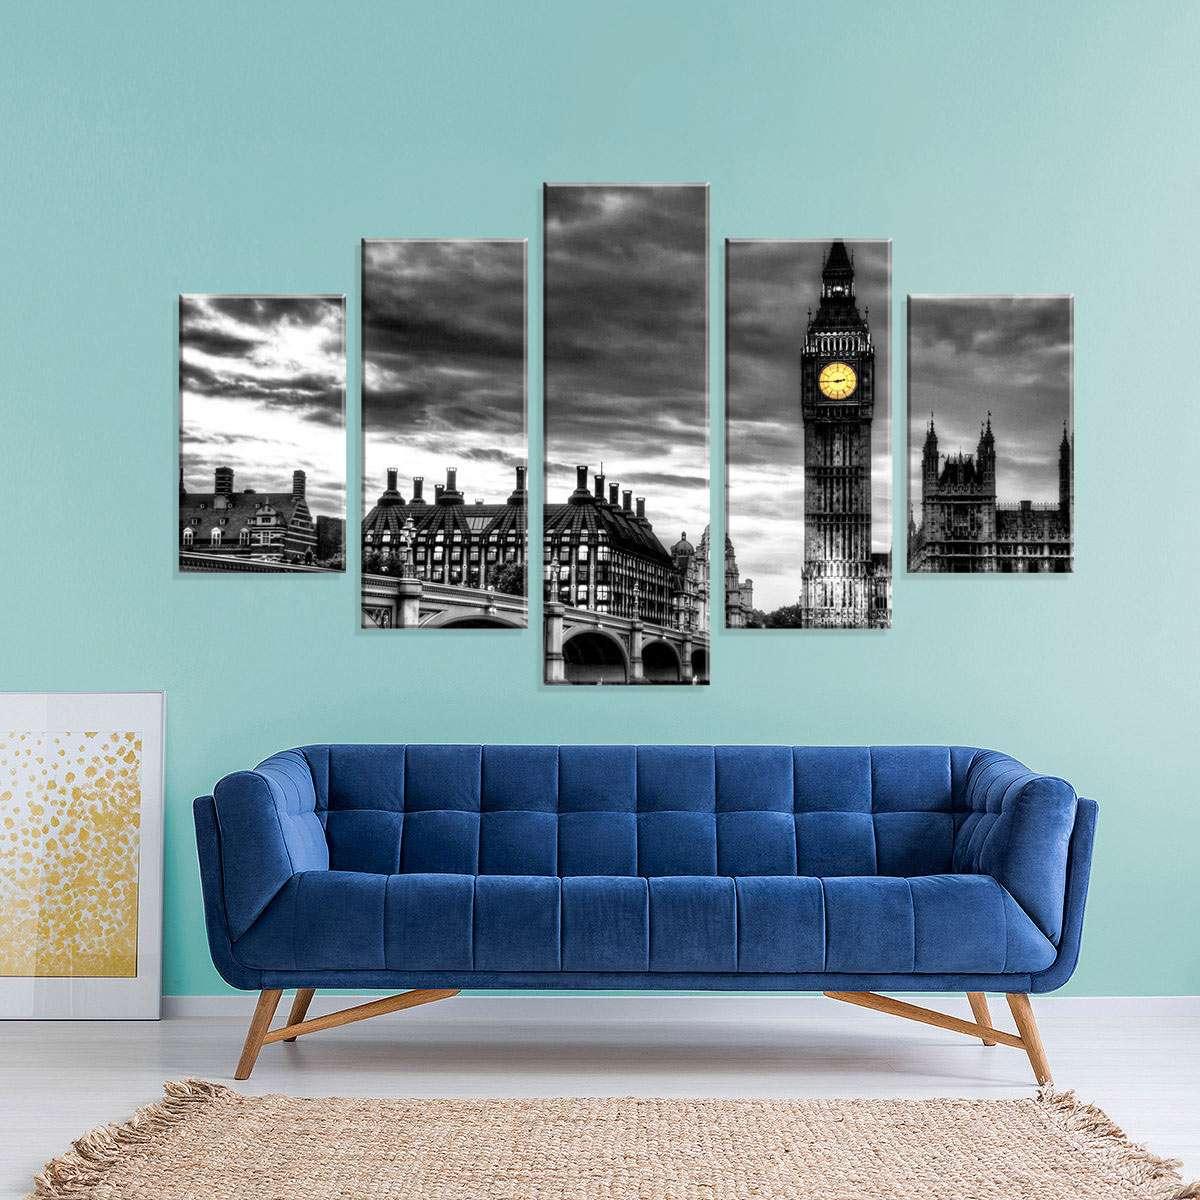 b2c8d273e Conjunto de 5 Telas Decorativas em Canvas London 110x55cm